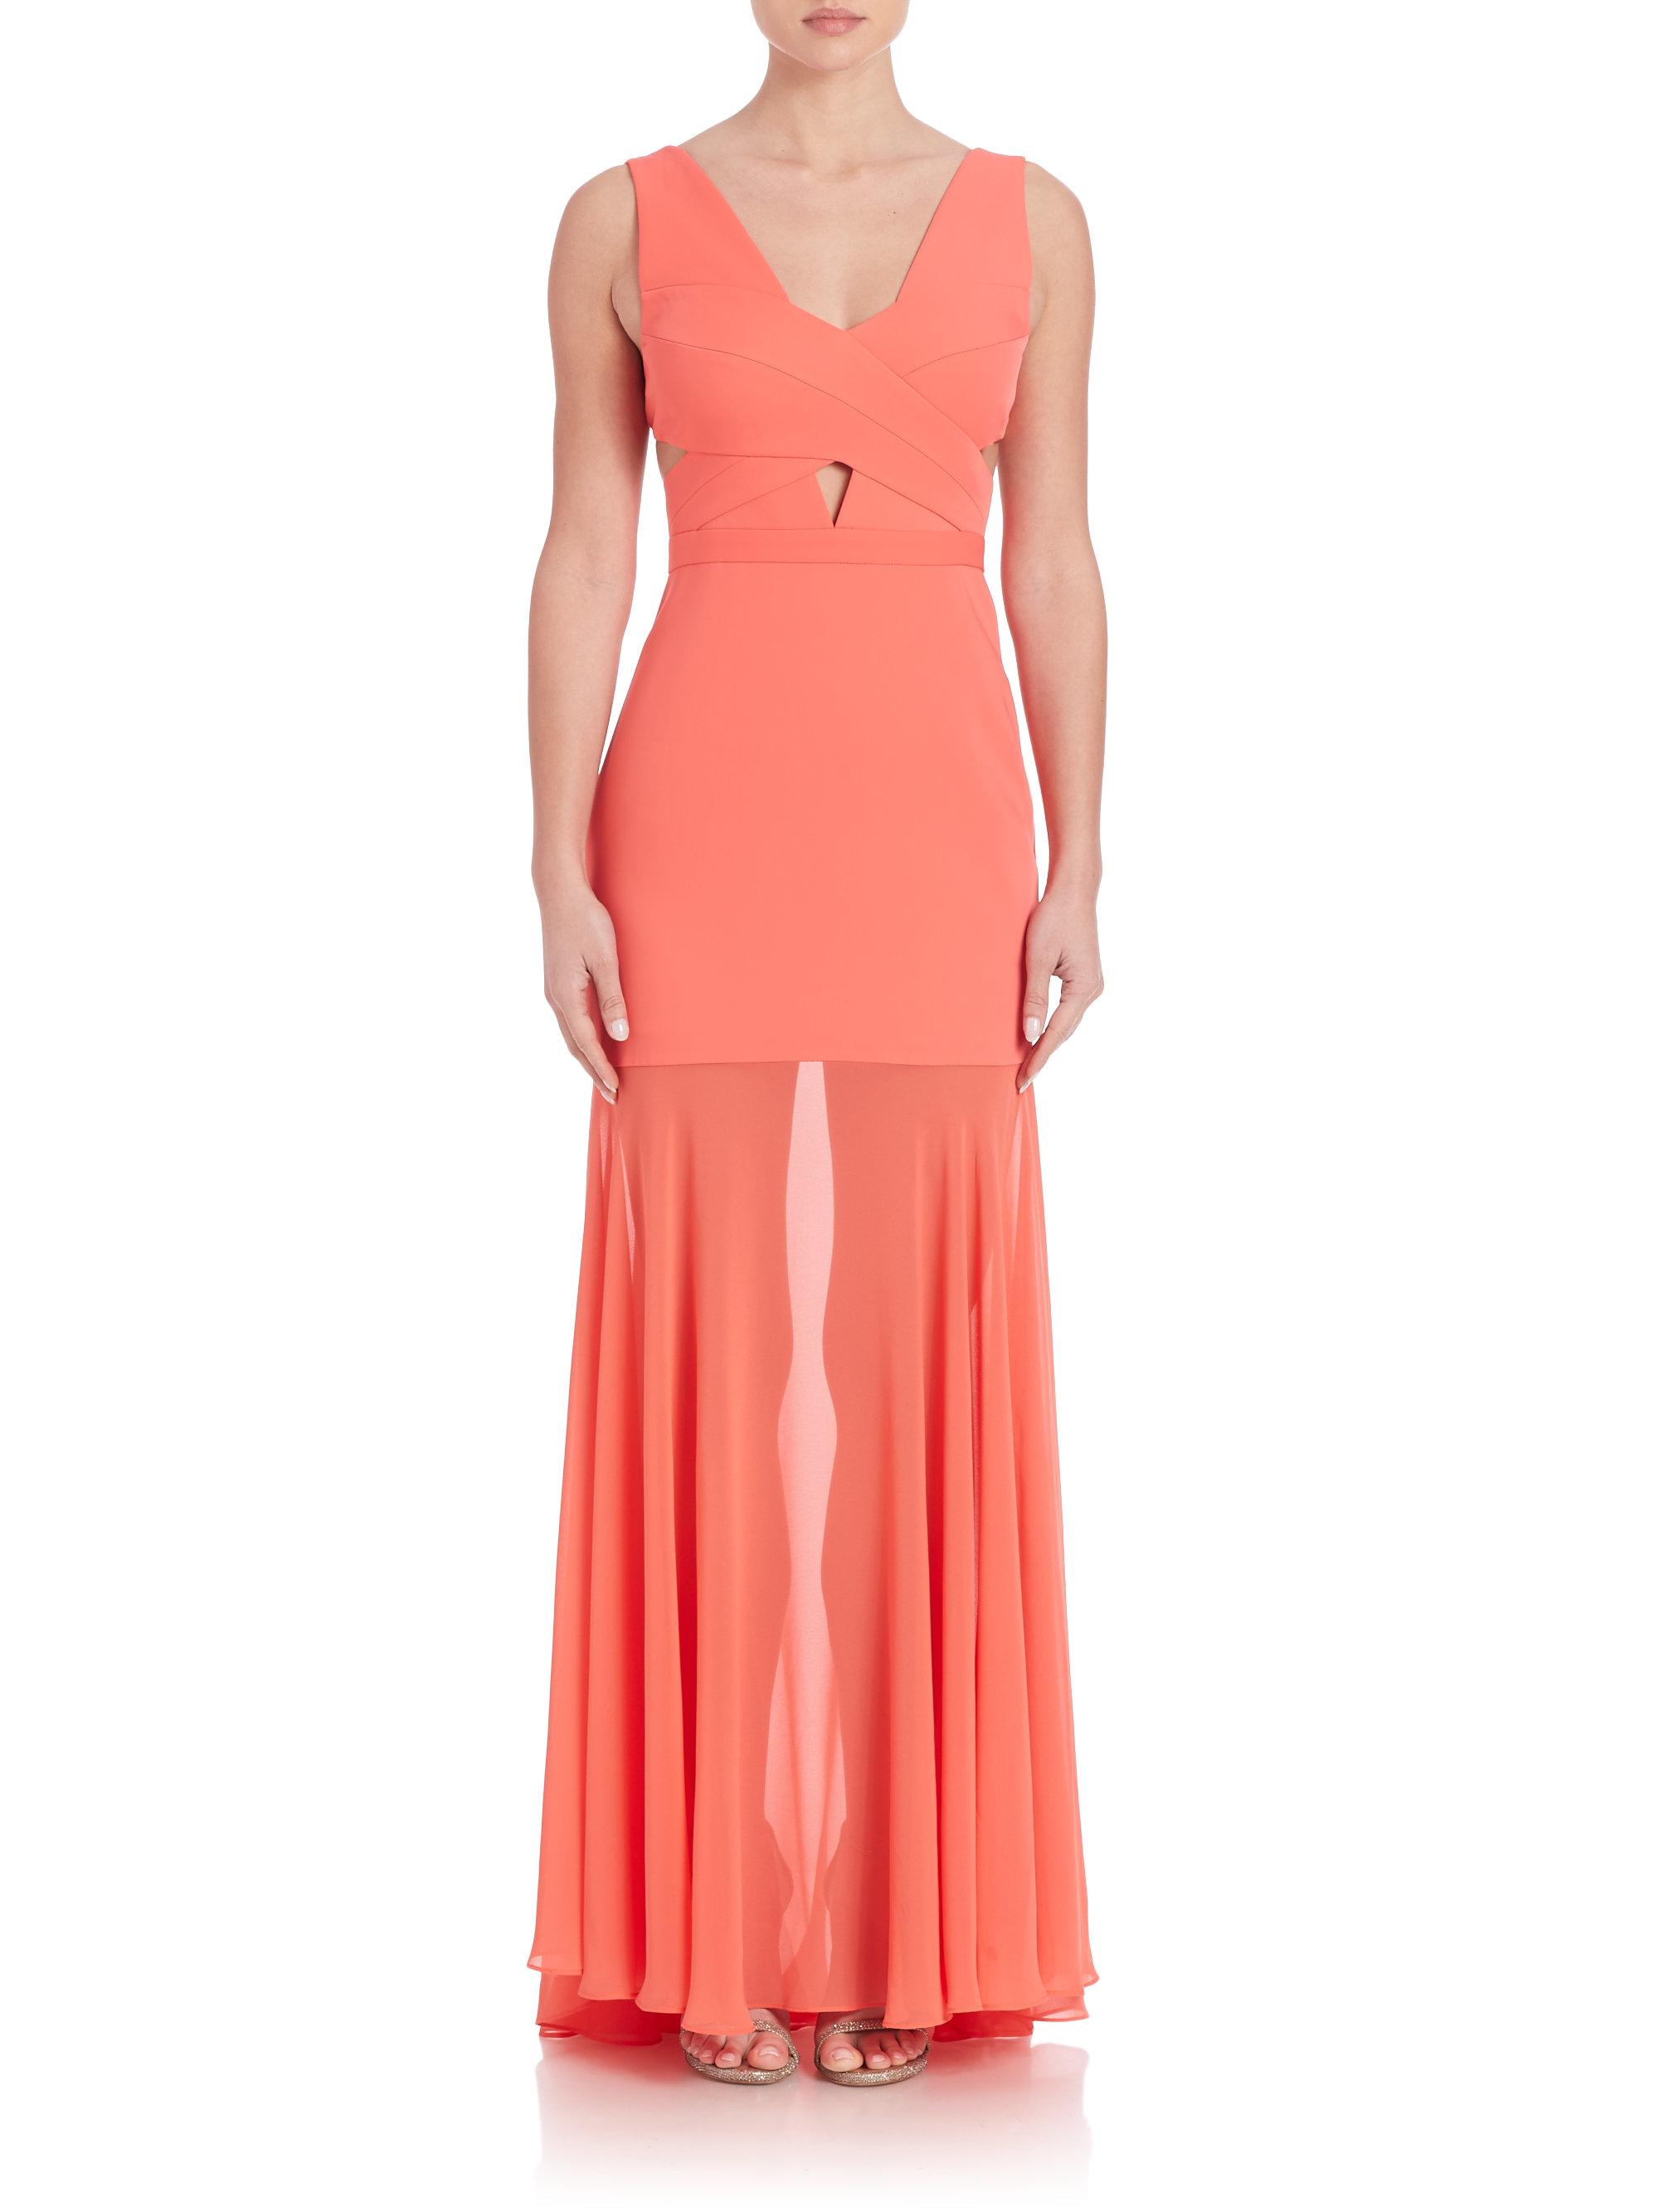 Lyst - Bcbgmaxazria Joy Cutout Gown in Orange